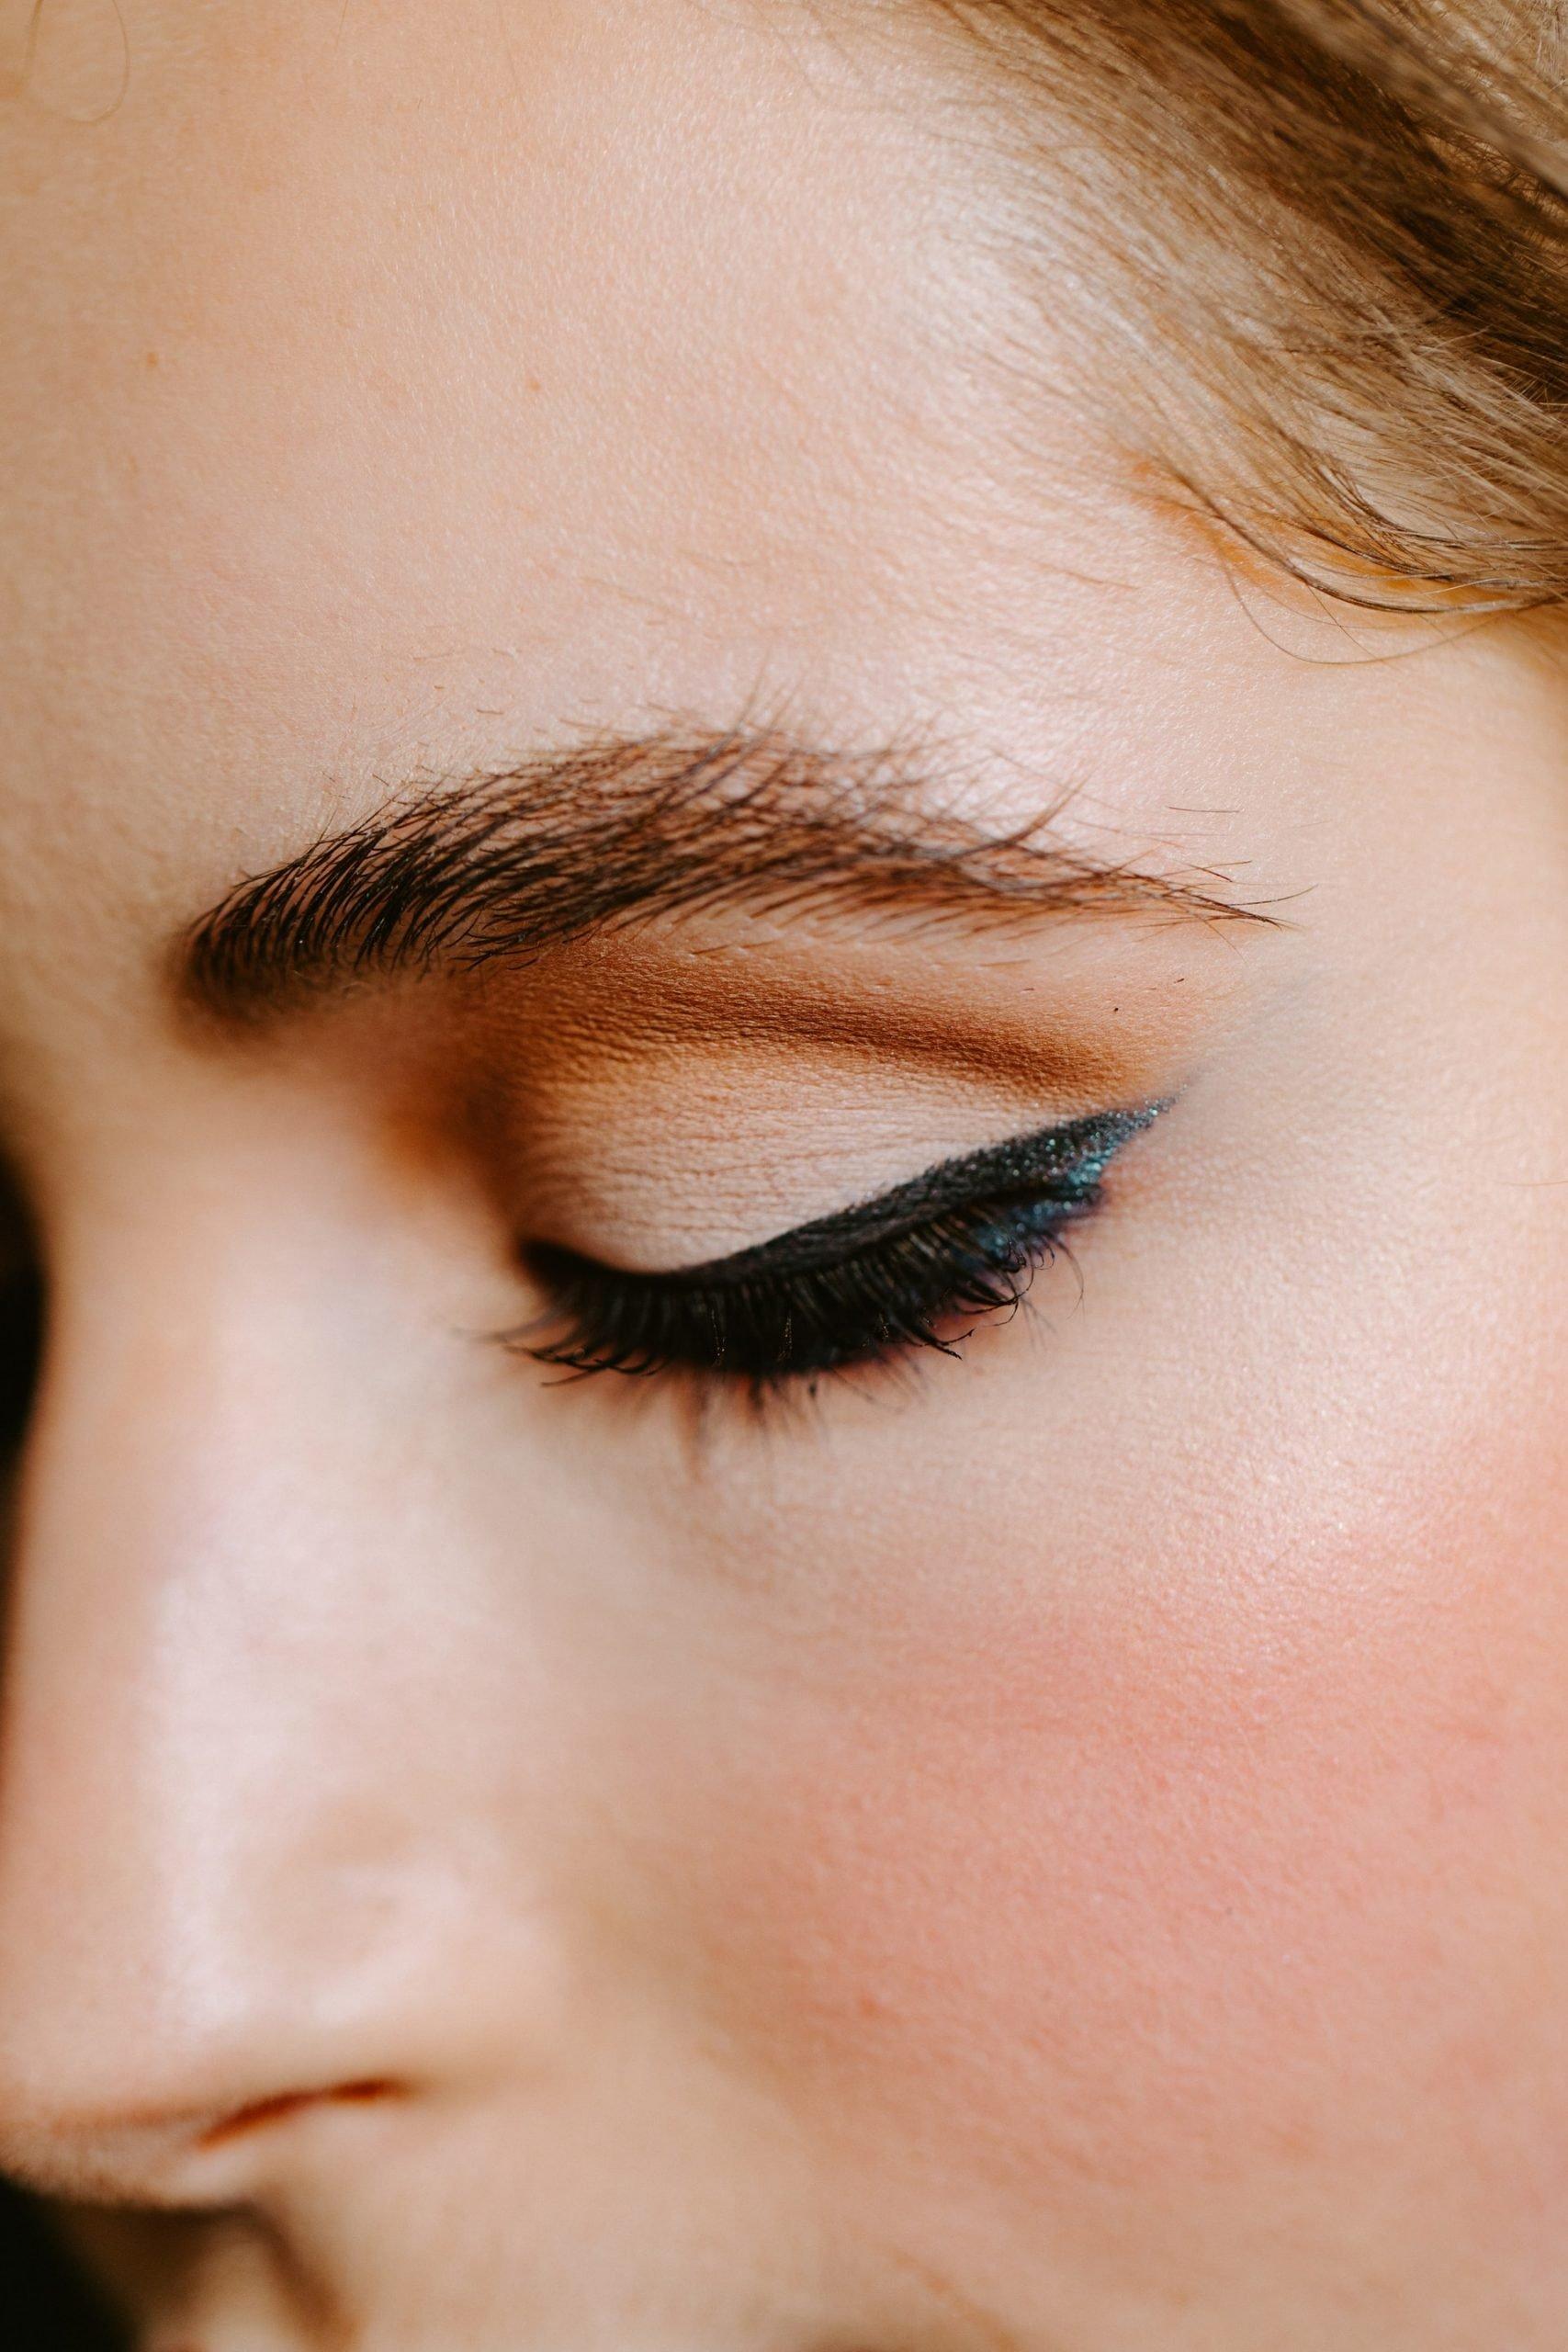 LOOKFANTASTIC BEAUTY ACADEMY: Come applicare l'eyeliner – 5 consigli per diventare una professionista!